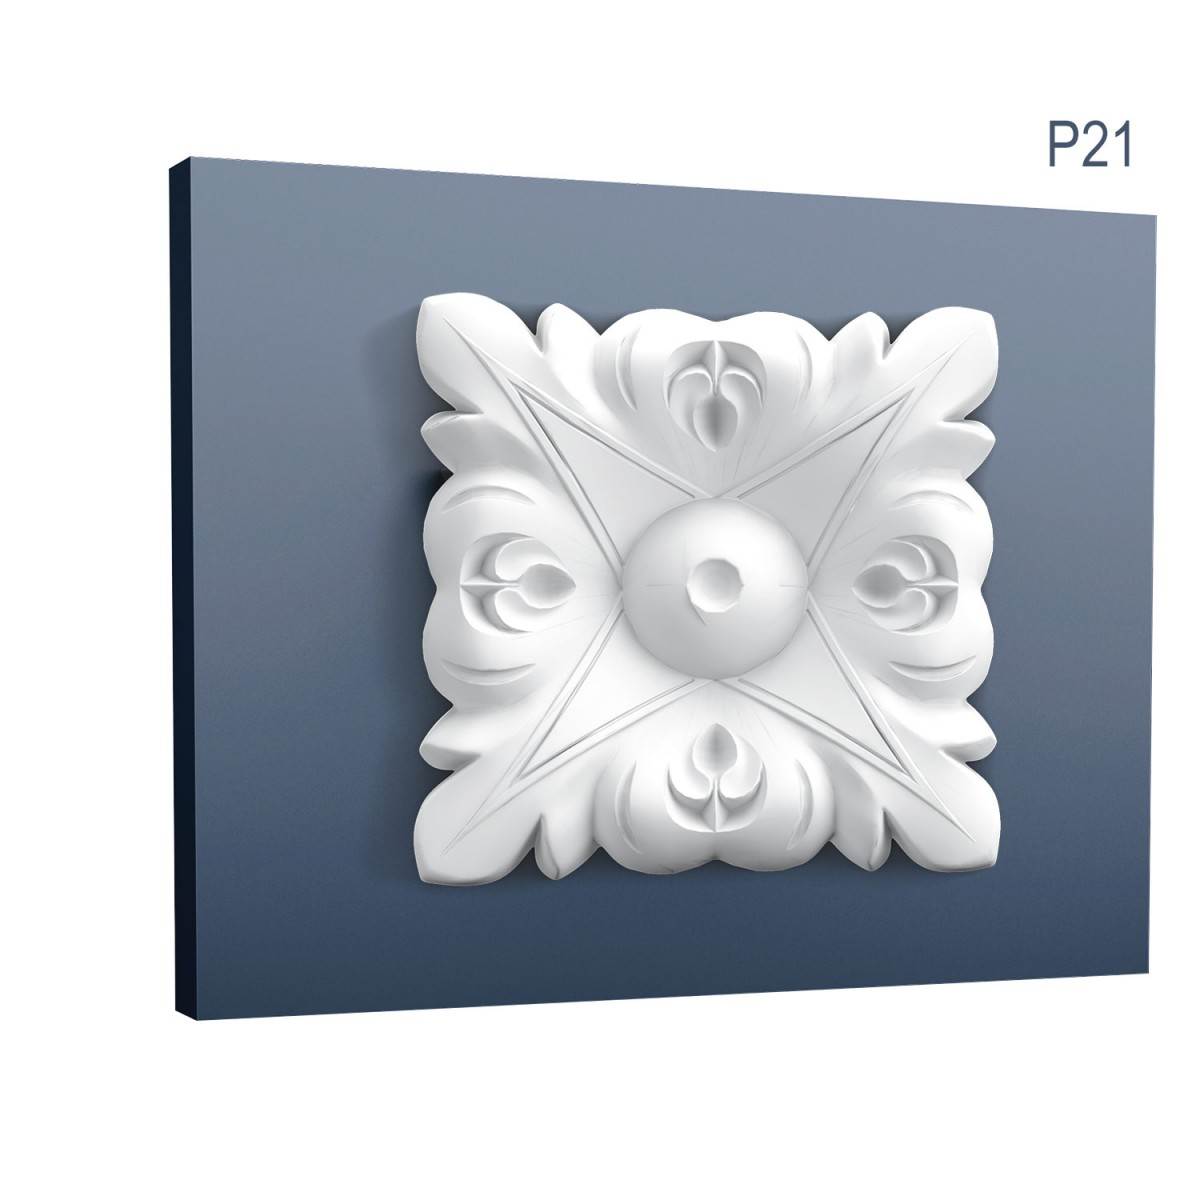 Ornament Luxxus P21, Dimensiuni: 6.7 X 6.7 X 0.9 cm, Orac Decor